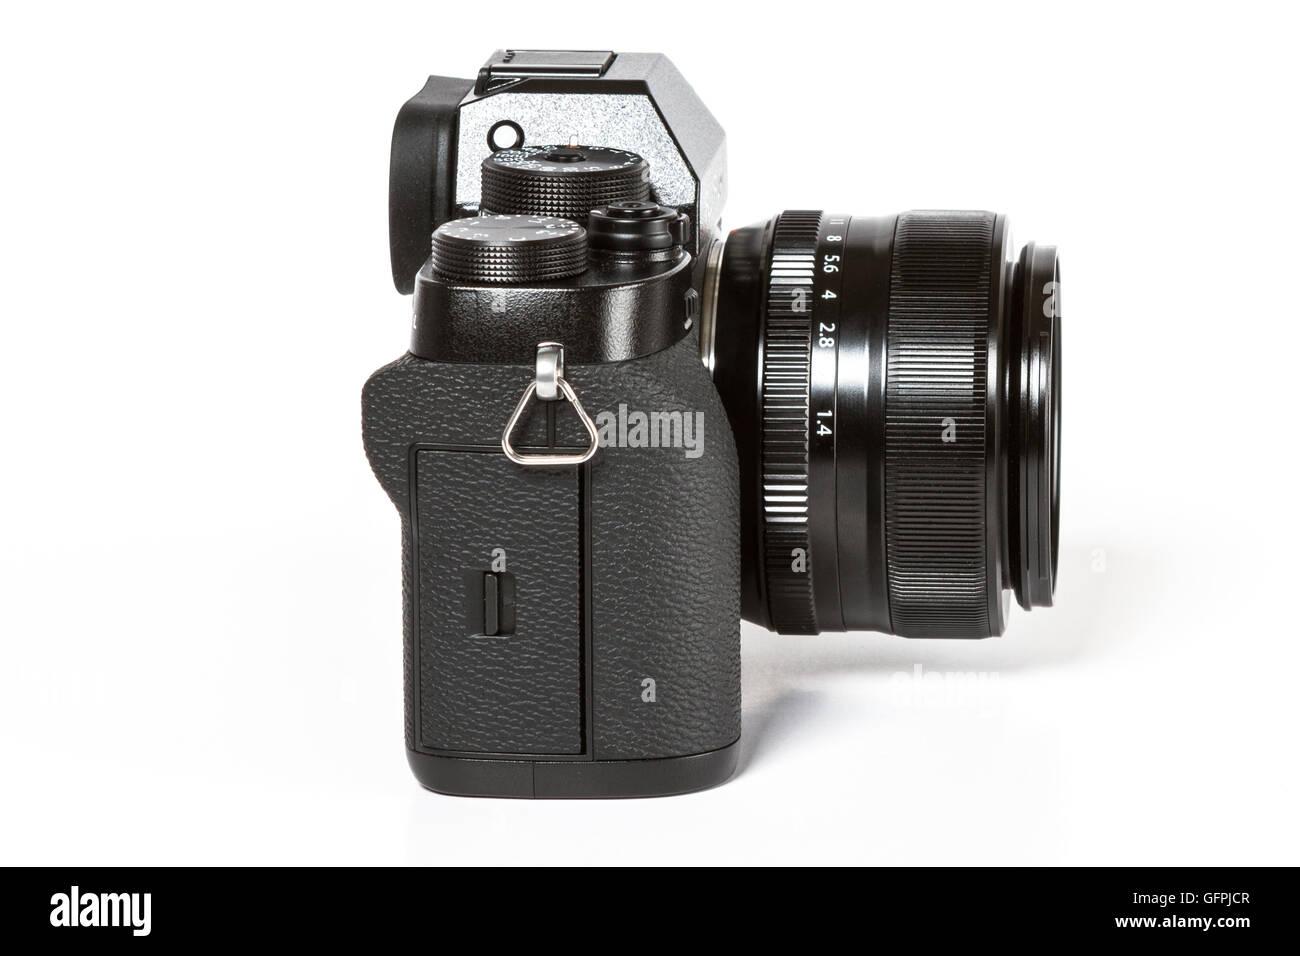 FUJIFILM X-T2, 24 megapixels, 4K video mirrorless camera on white background - Stock Image